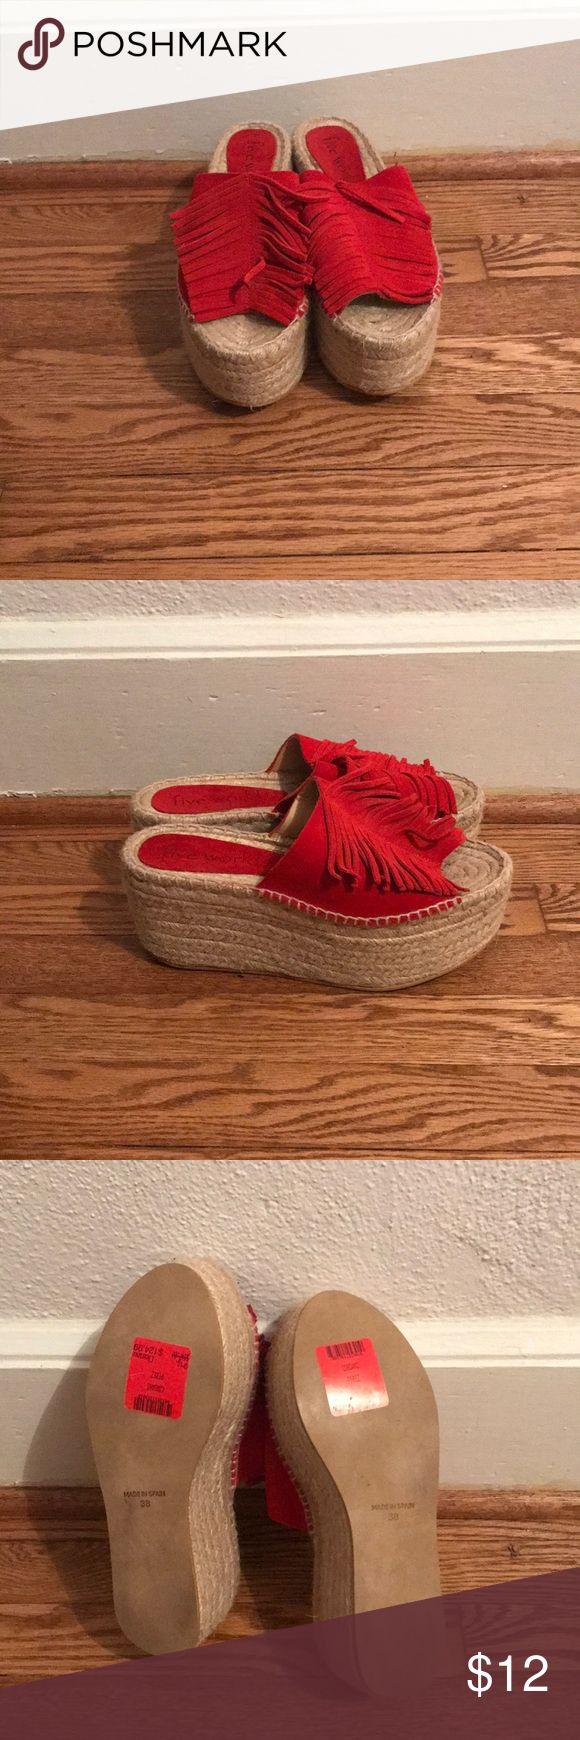 Red espadrilles Brand new, never worn espadrilles five worlds Shoes Espadrilles